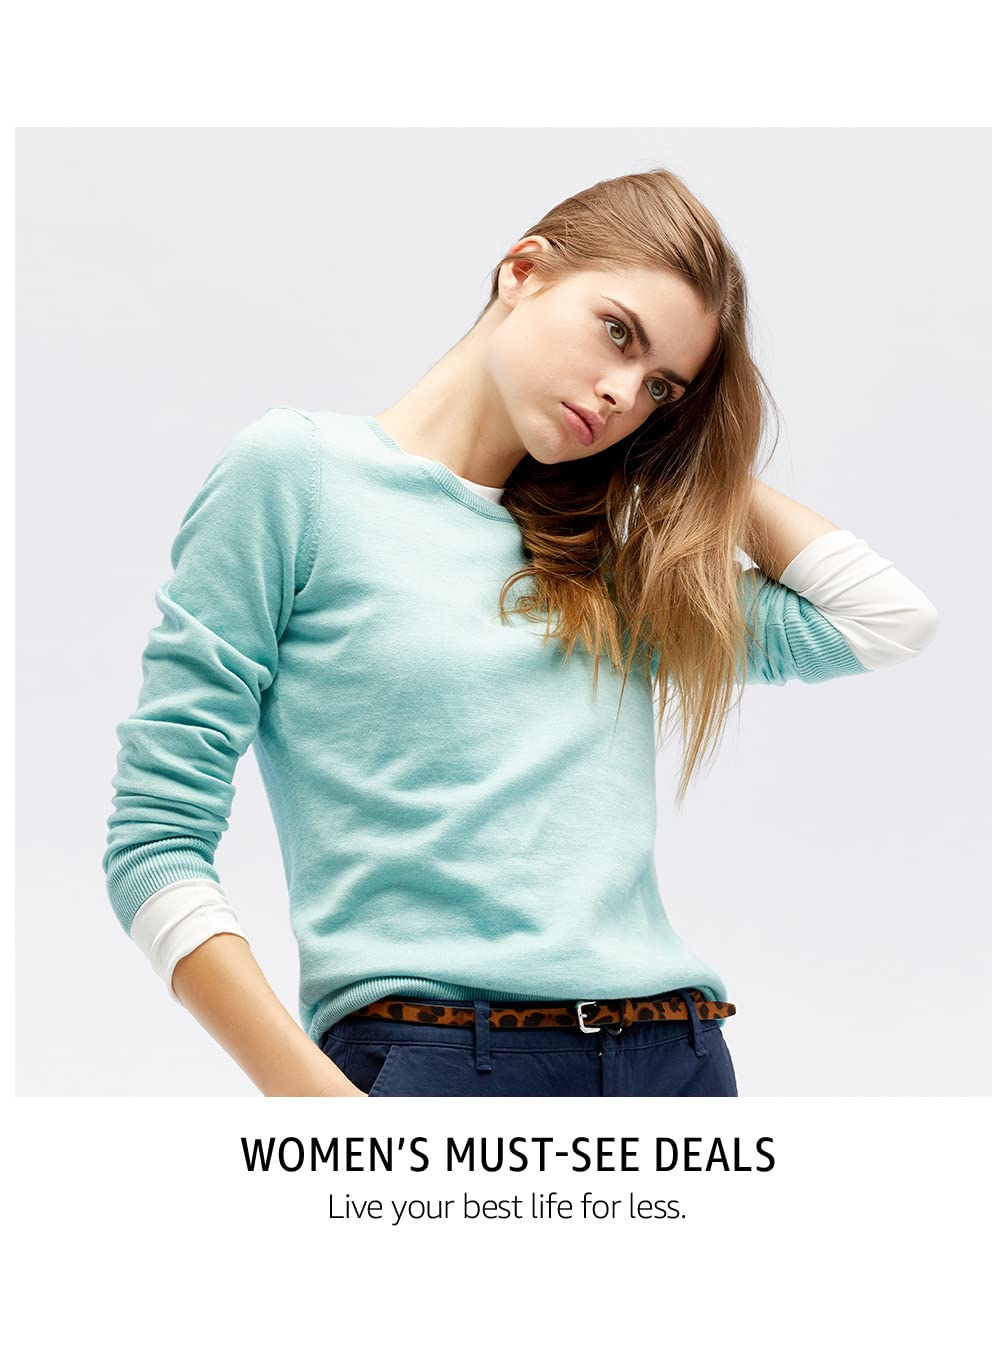 Women's must-see deals